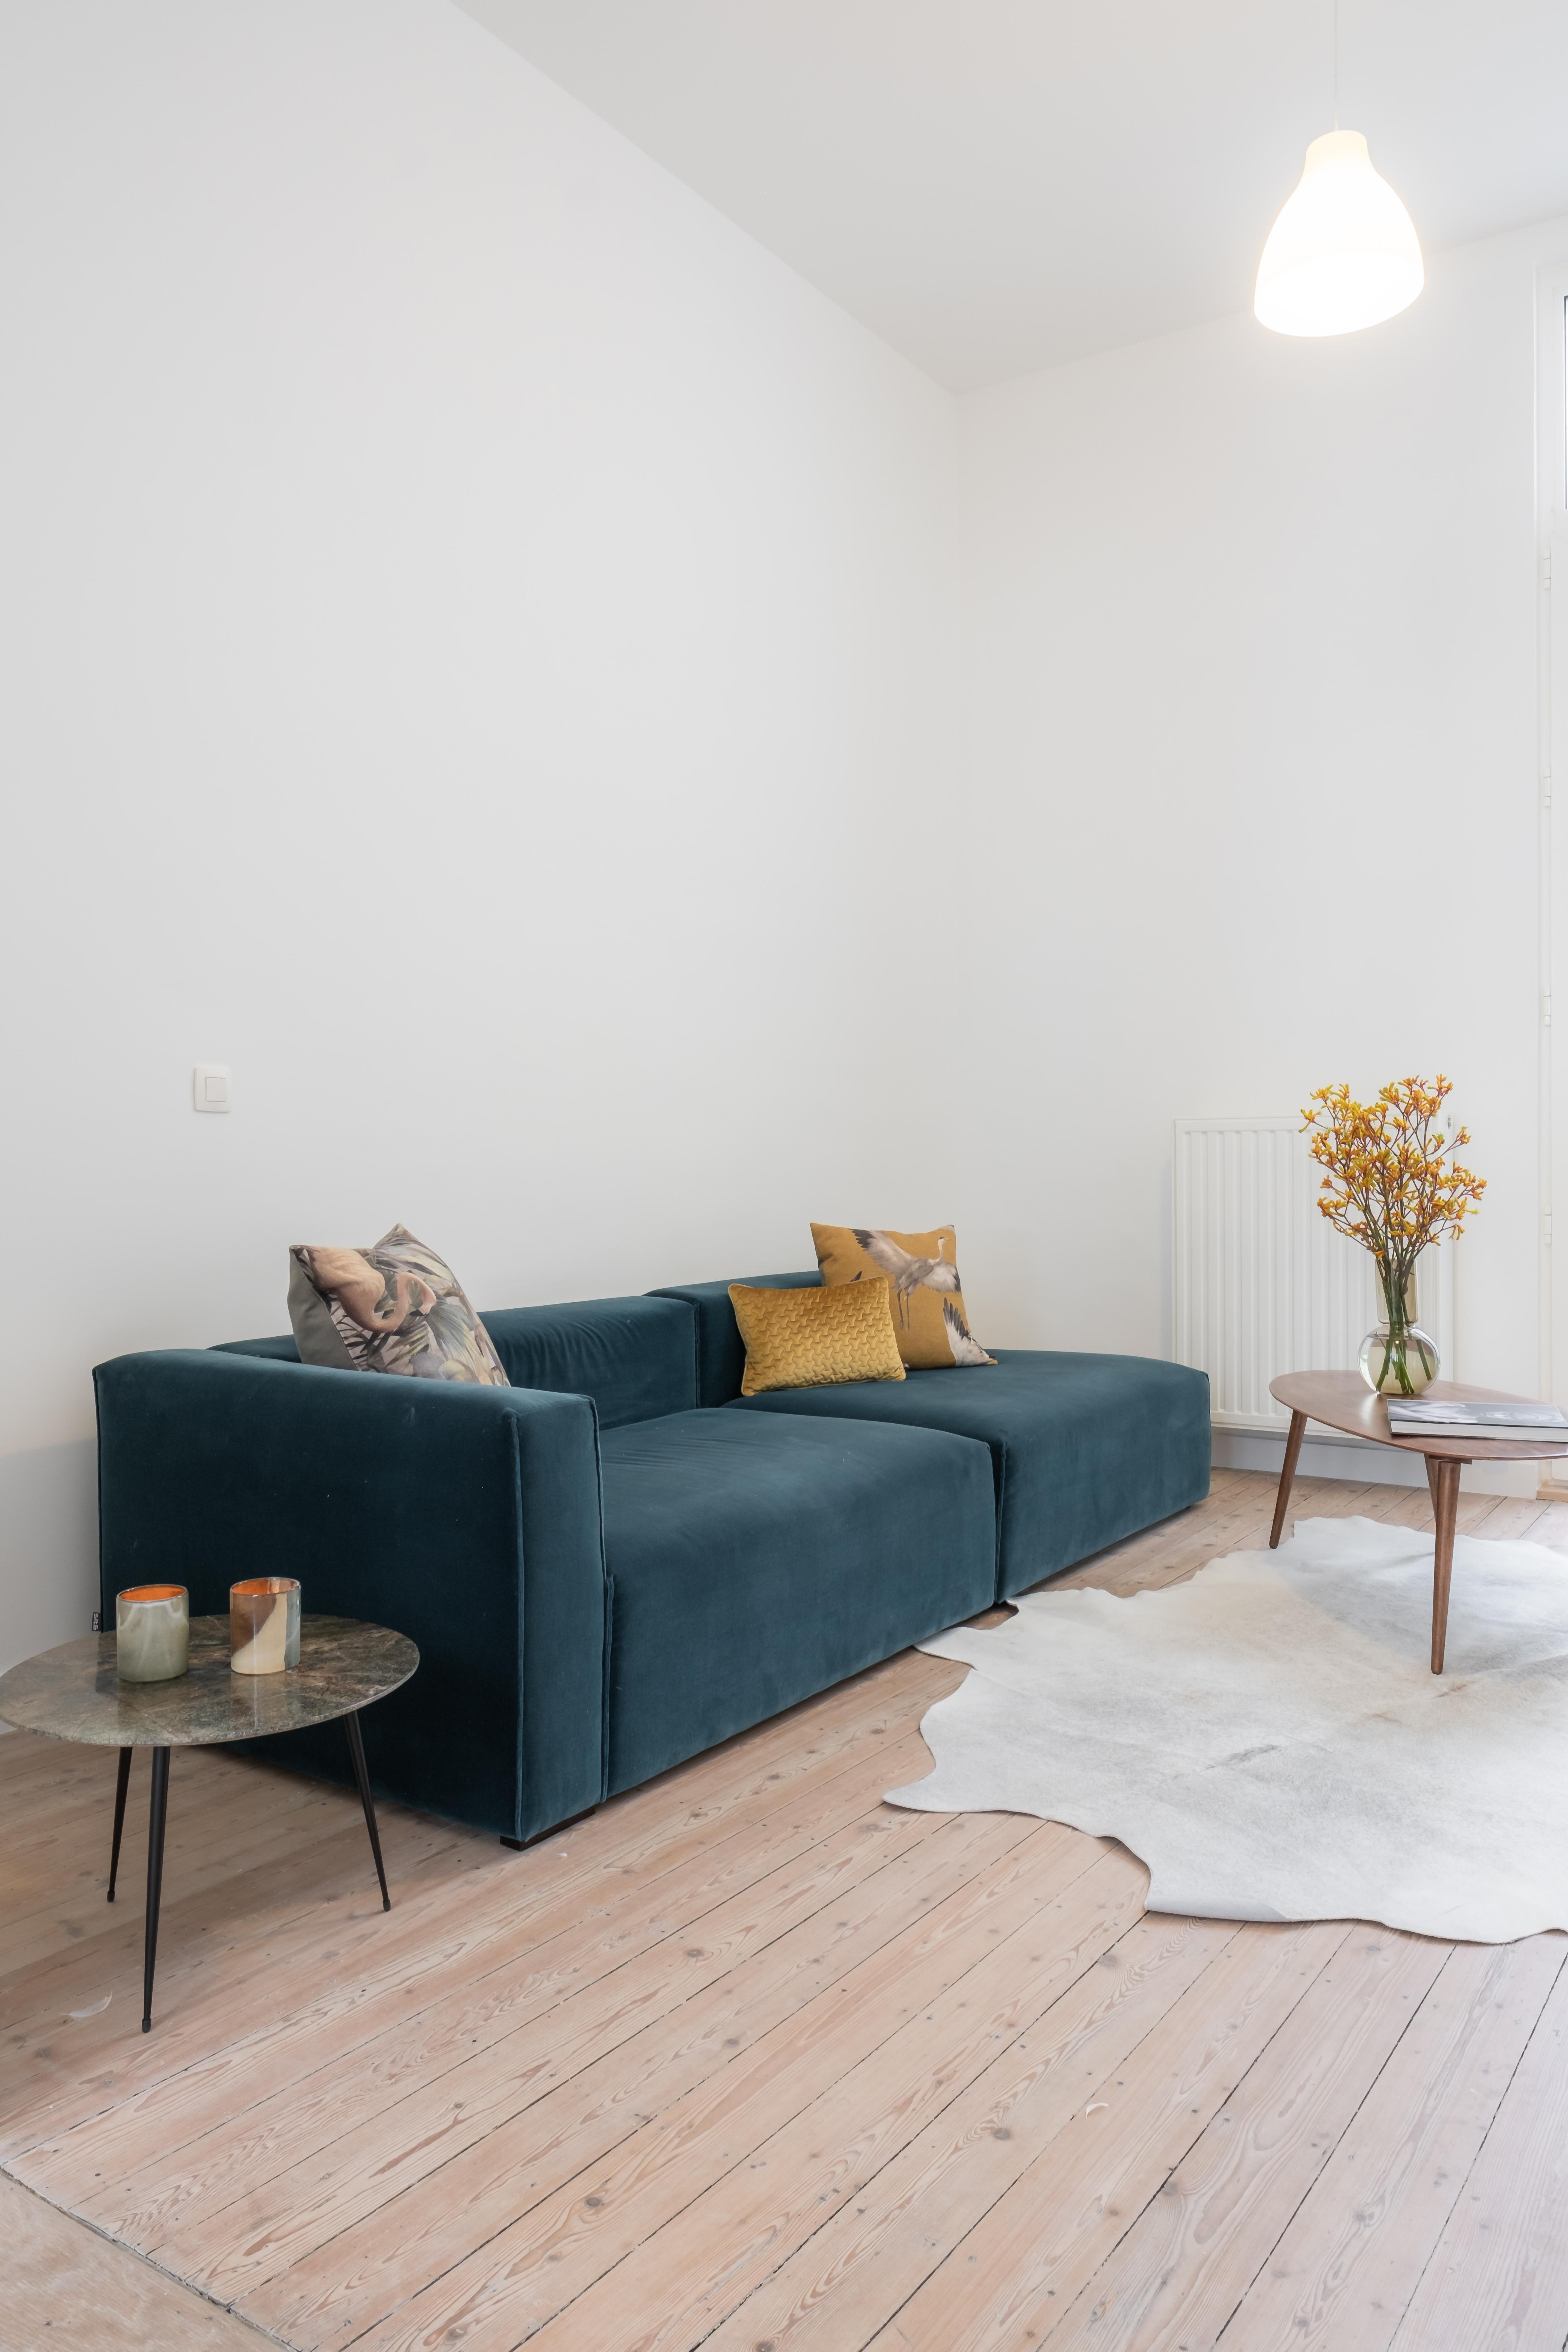 Jan Van Beersstraat 4 velvet sofa